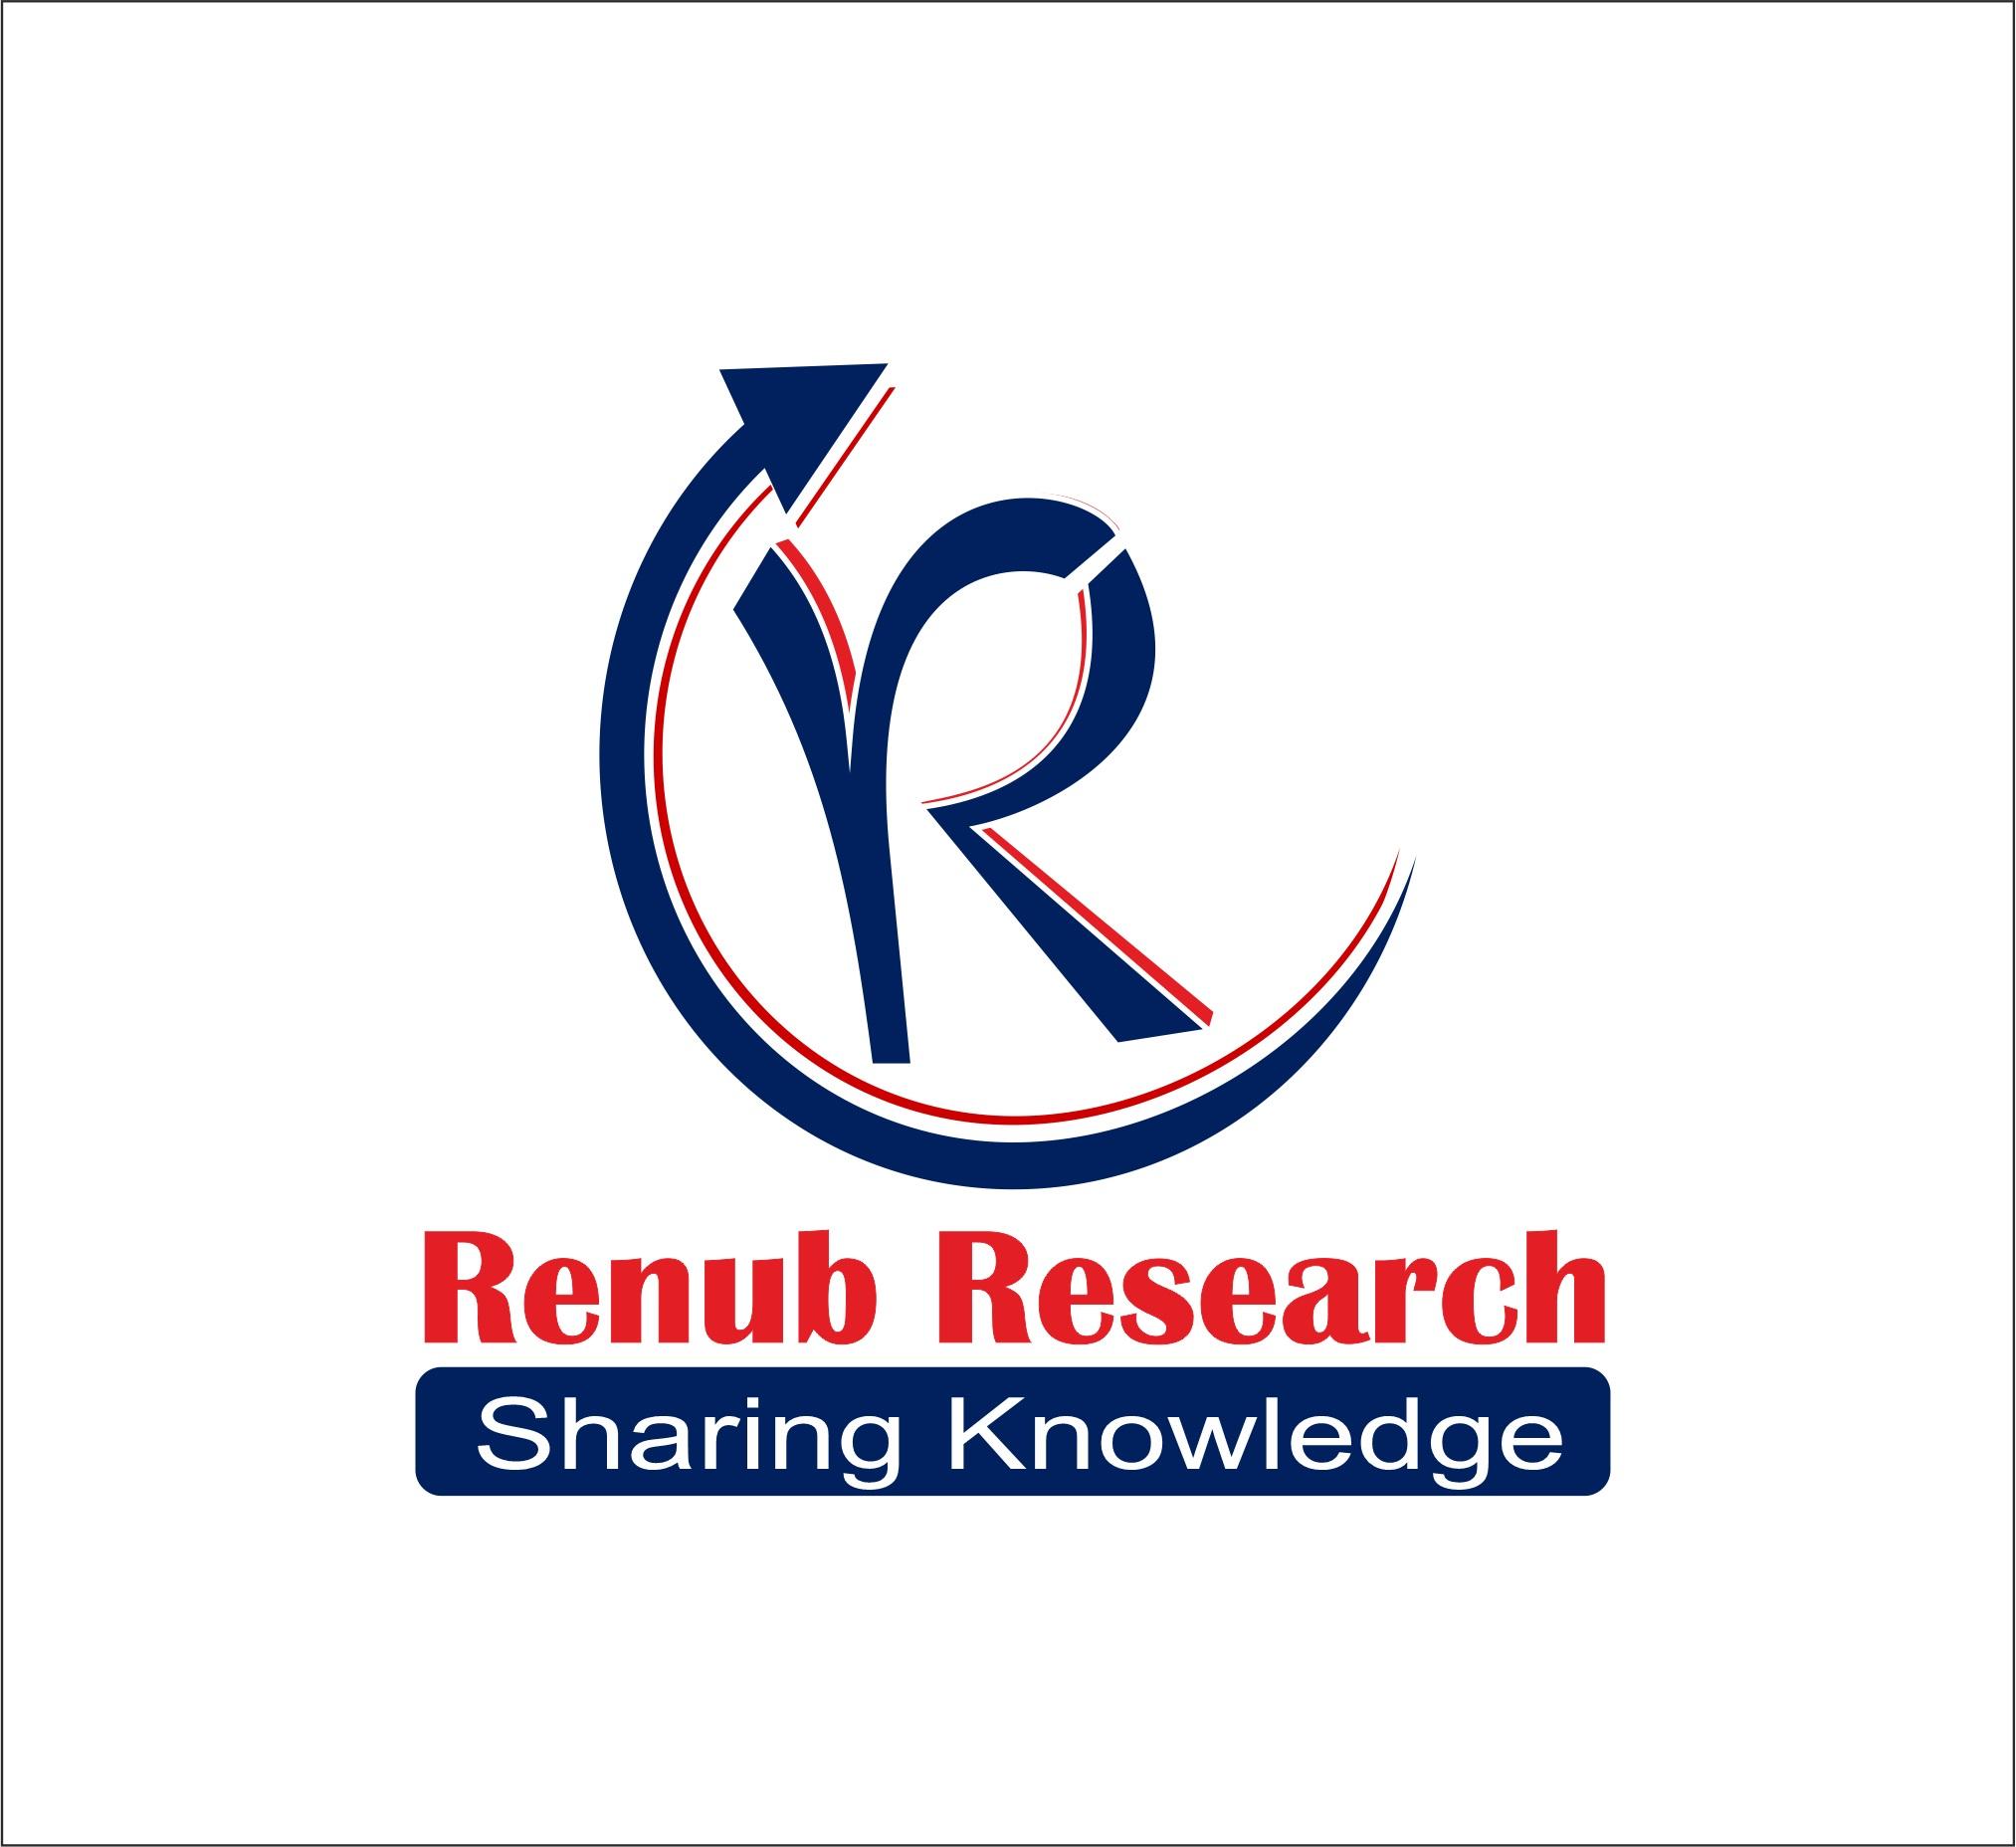 Global Diabetes Drug Market will be US$ 78.10 Billion by 2026 | Renub Research